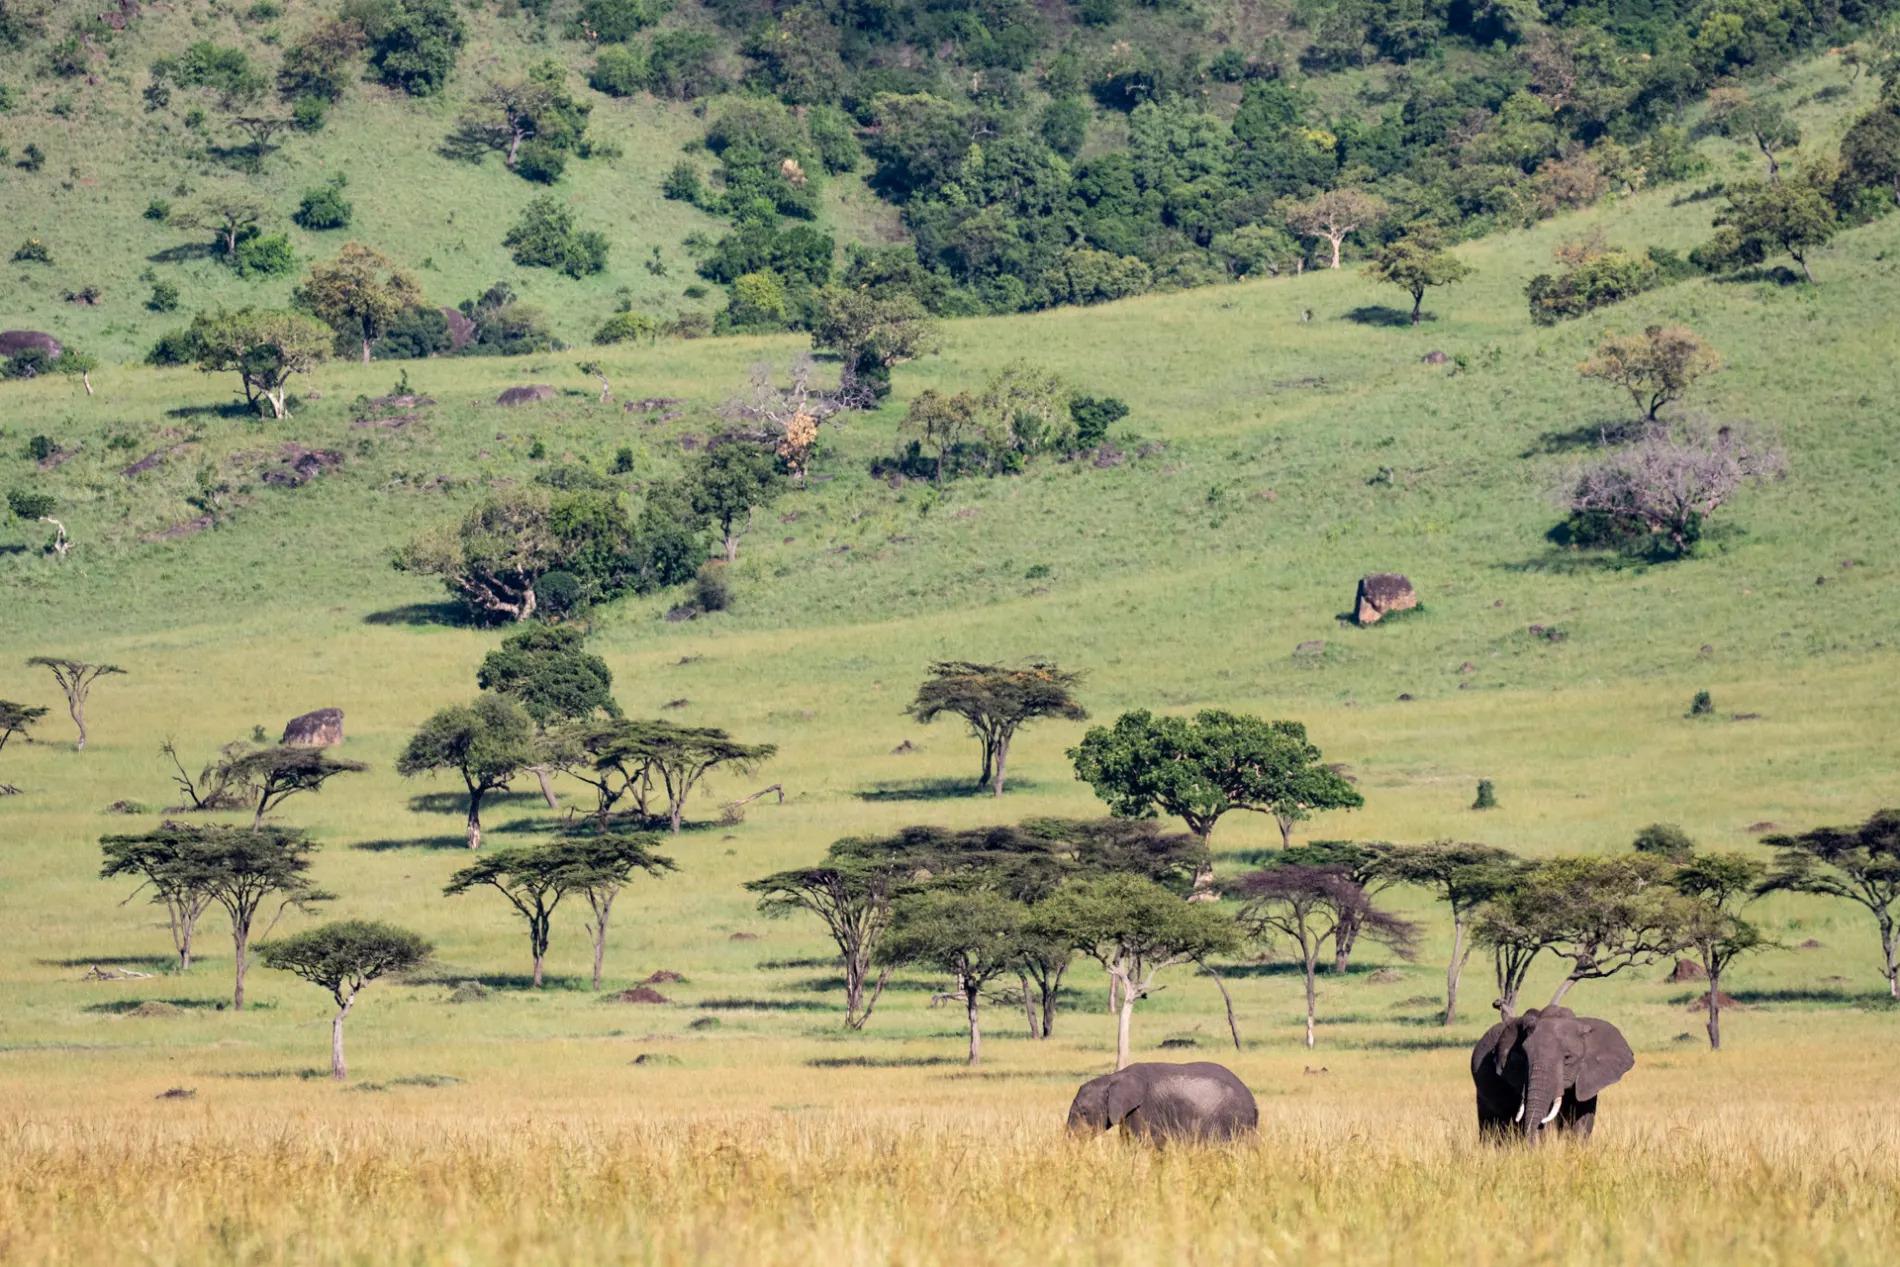 ELEPHANTS GRAZING 1